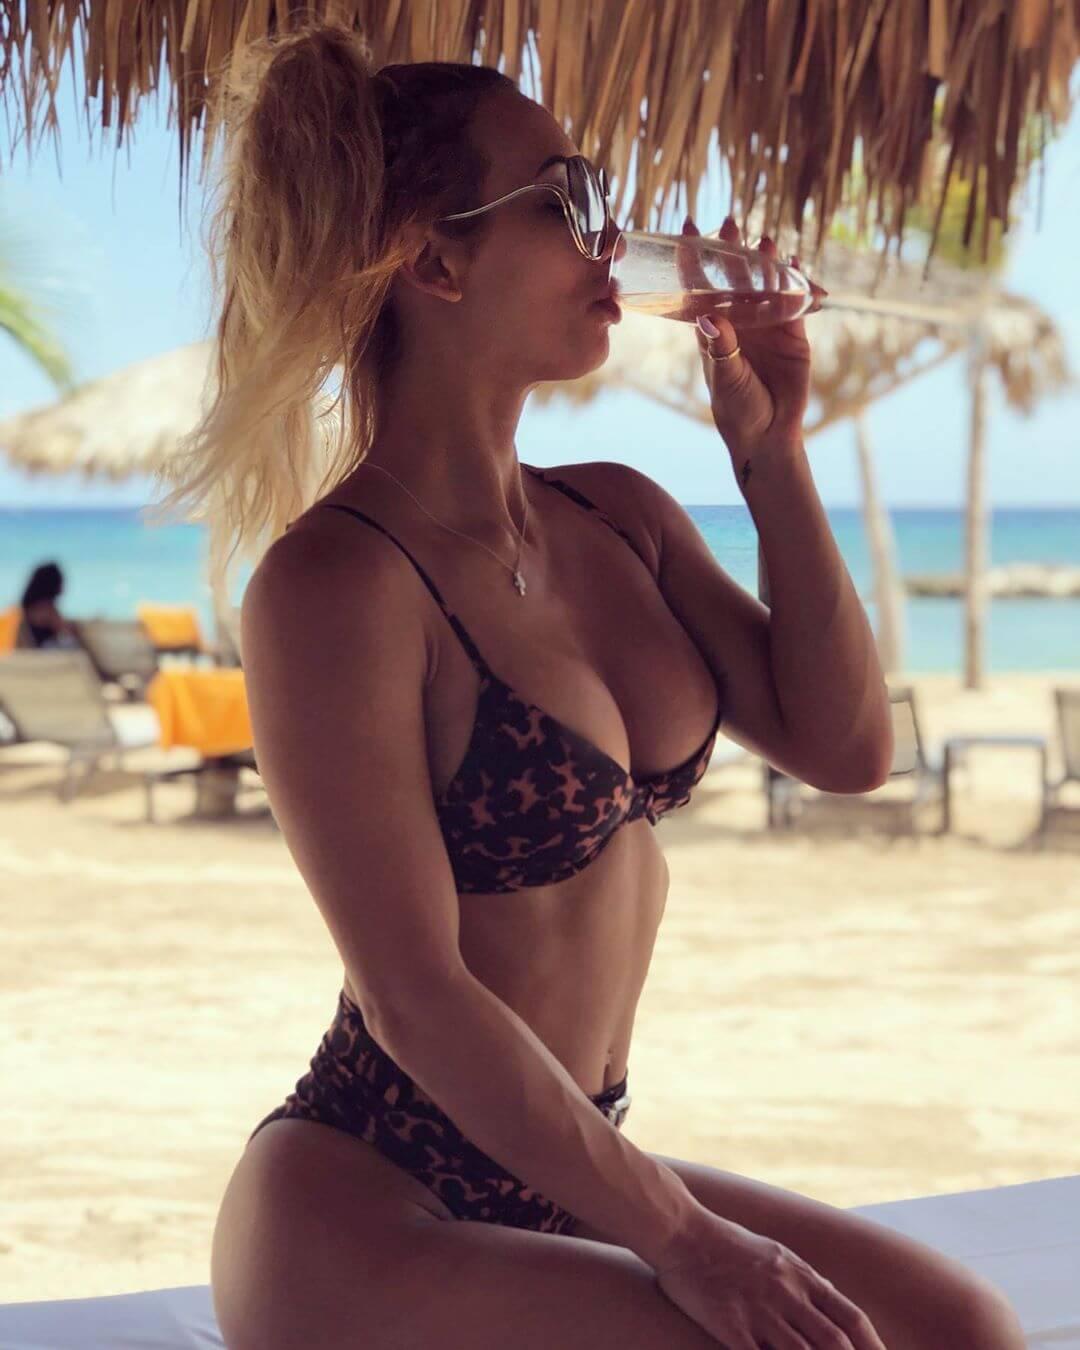 Carmella sexy bikini pic